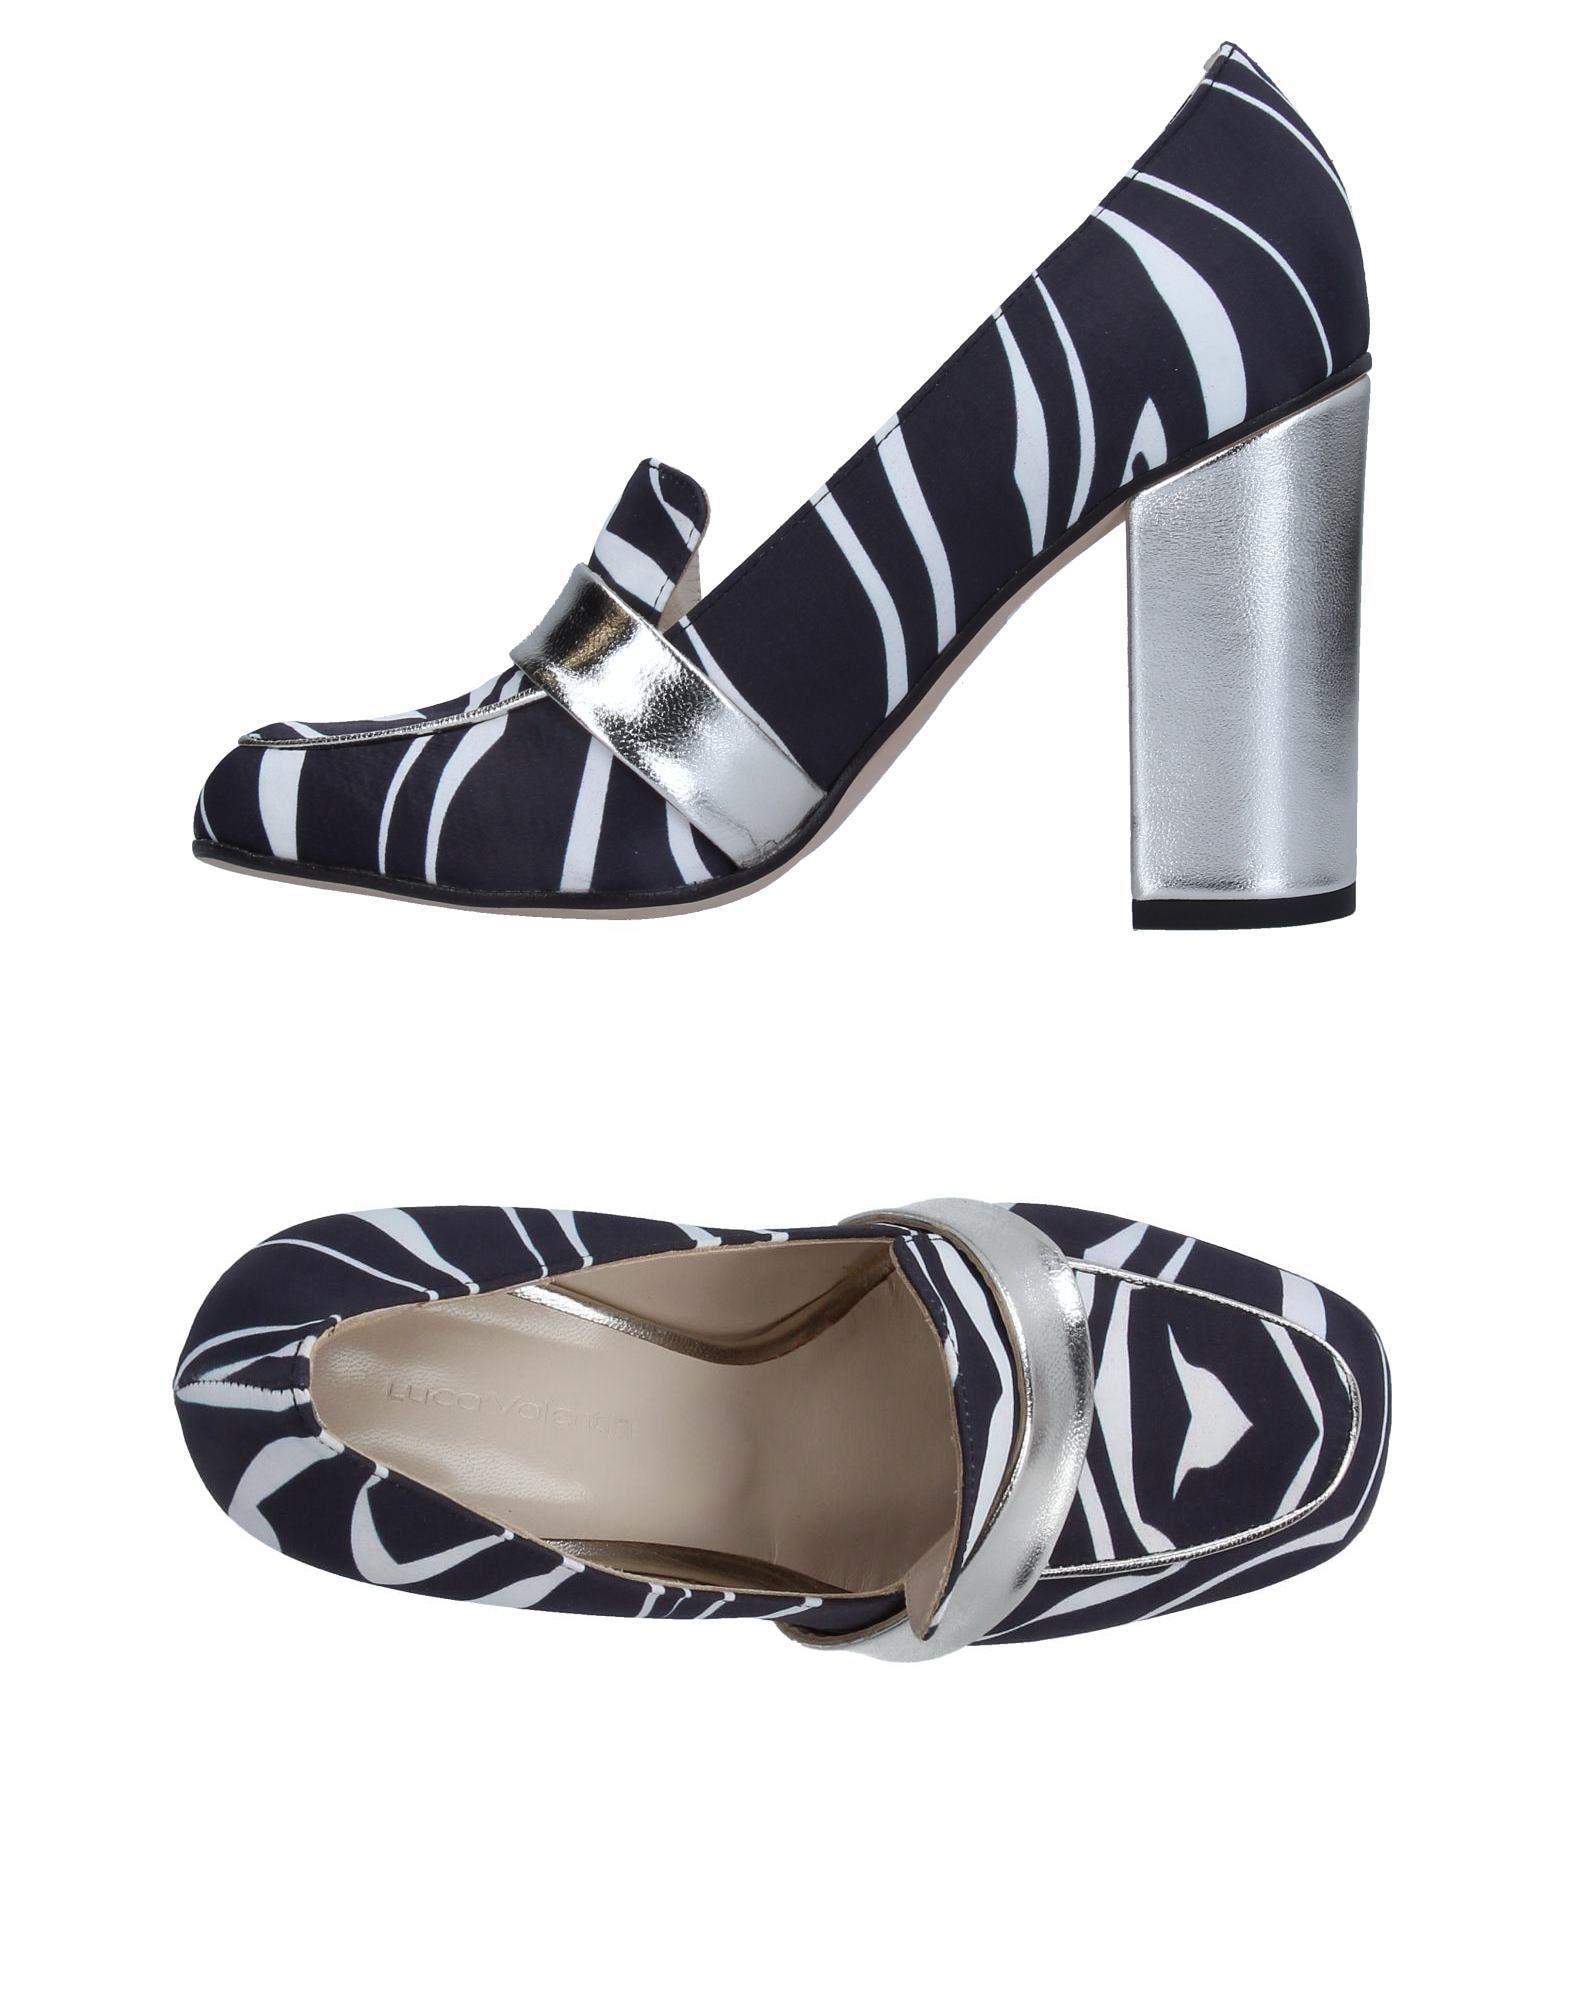 Luca Valentini Mokassins Damen  11338200OD Gute Qualität beliebte Schuhe